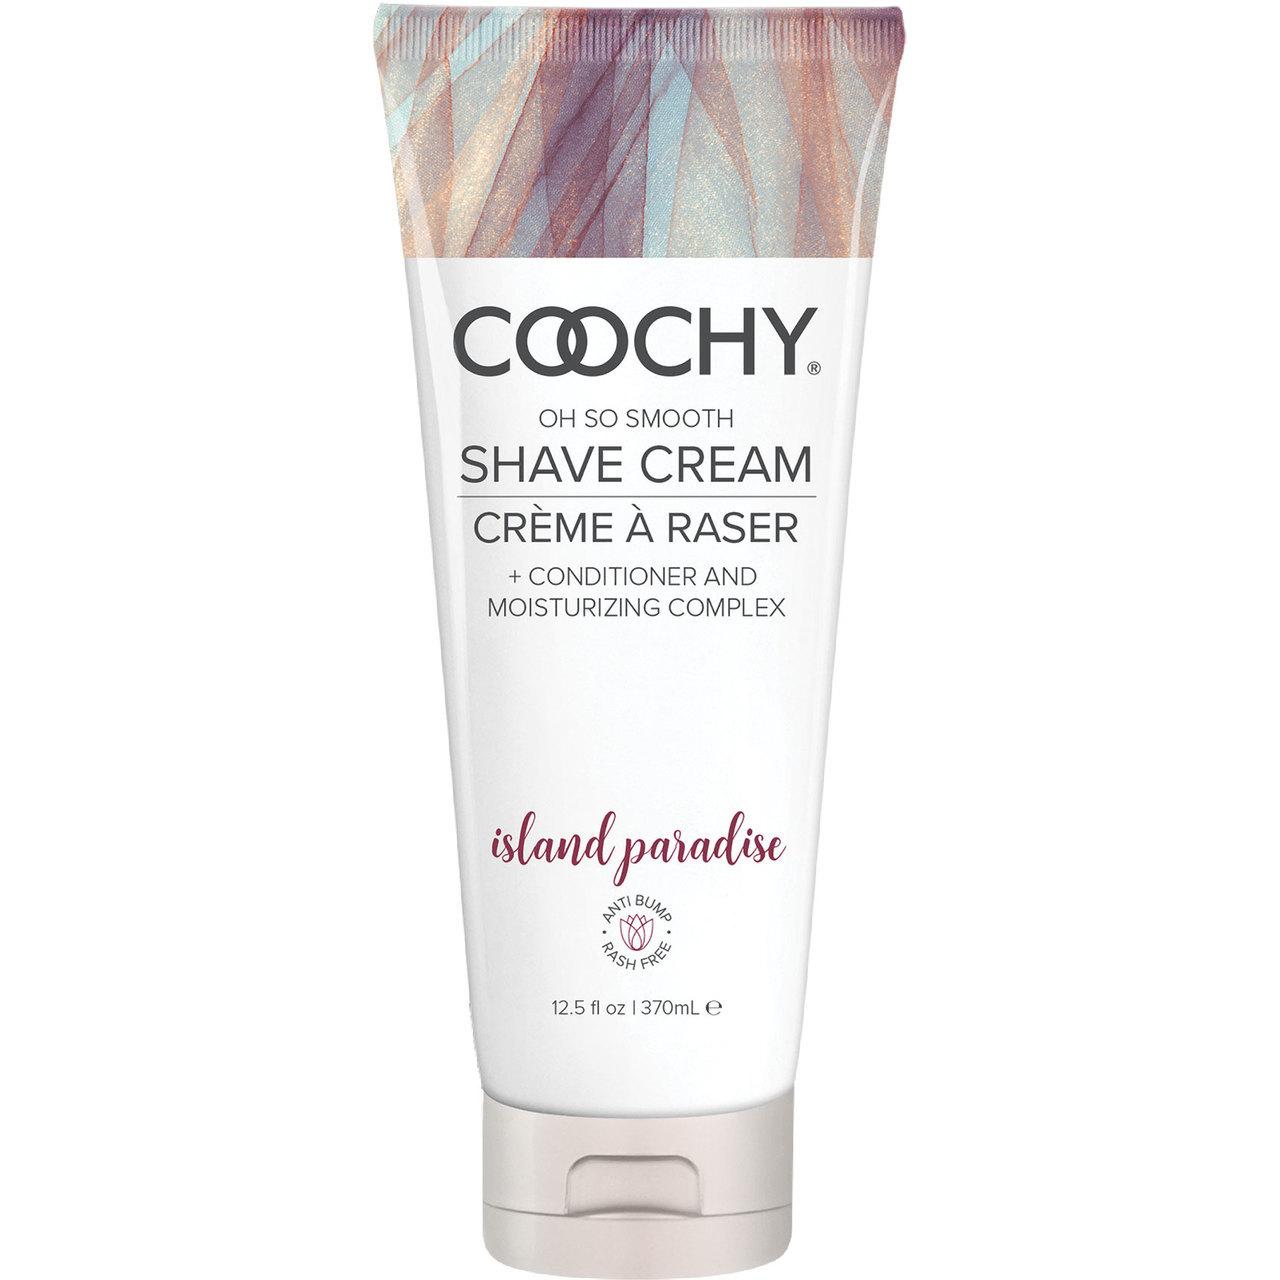 COOCHY Oh So Smooth Shave Cream - Island Paradise